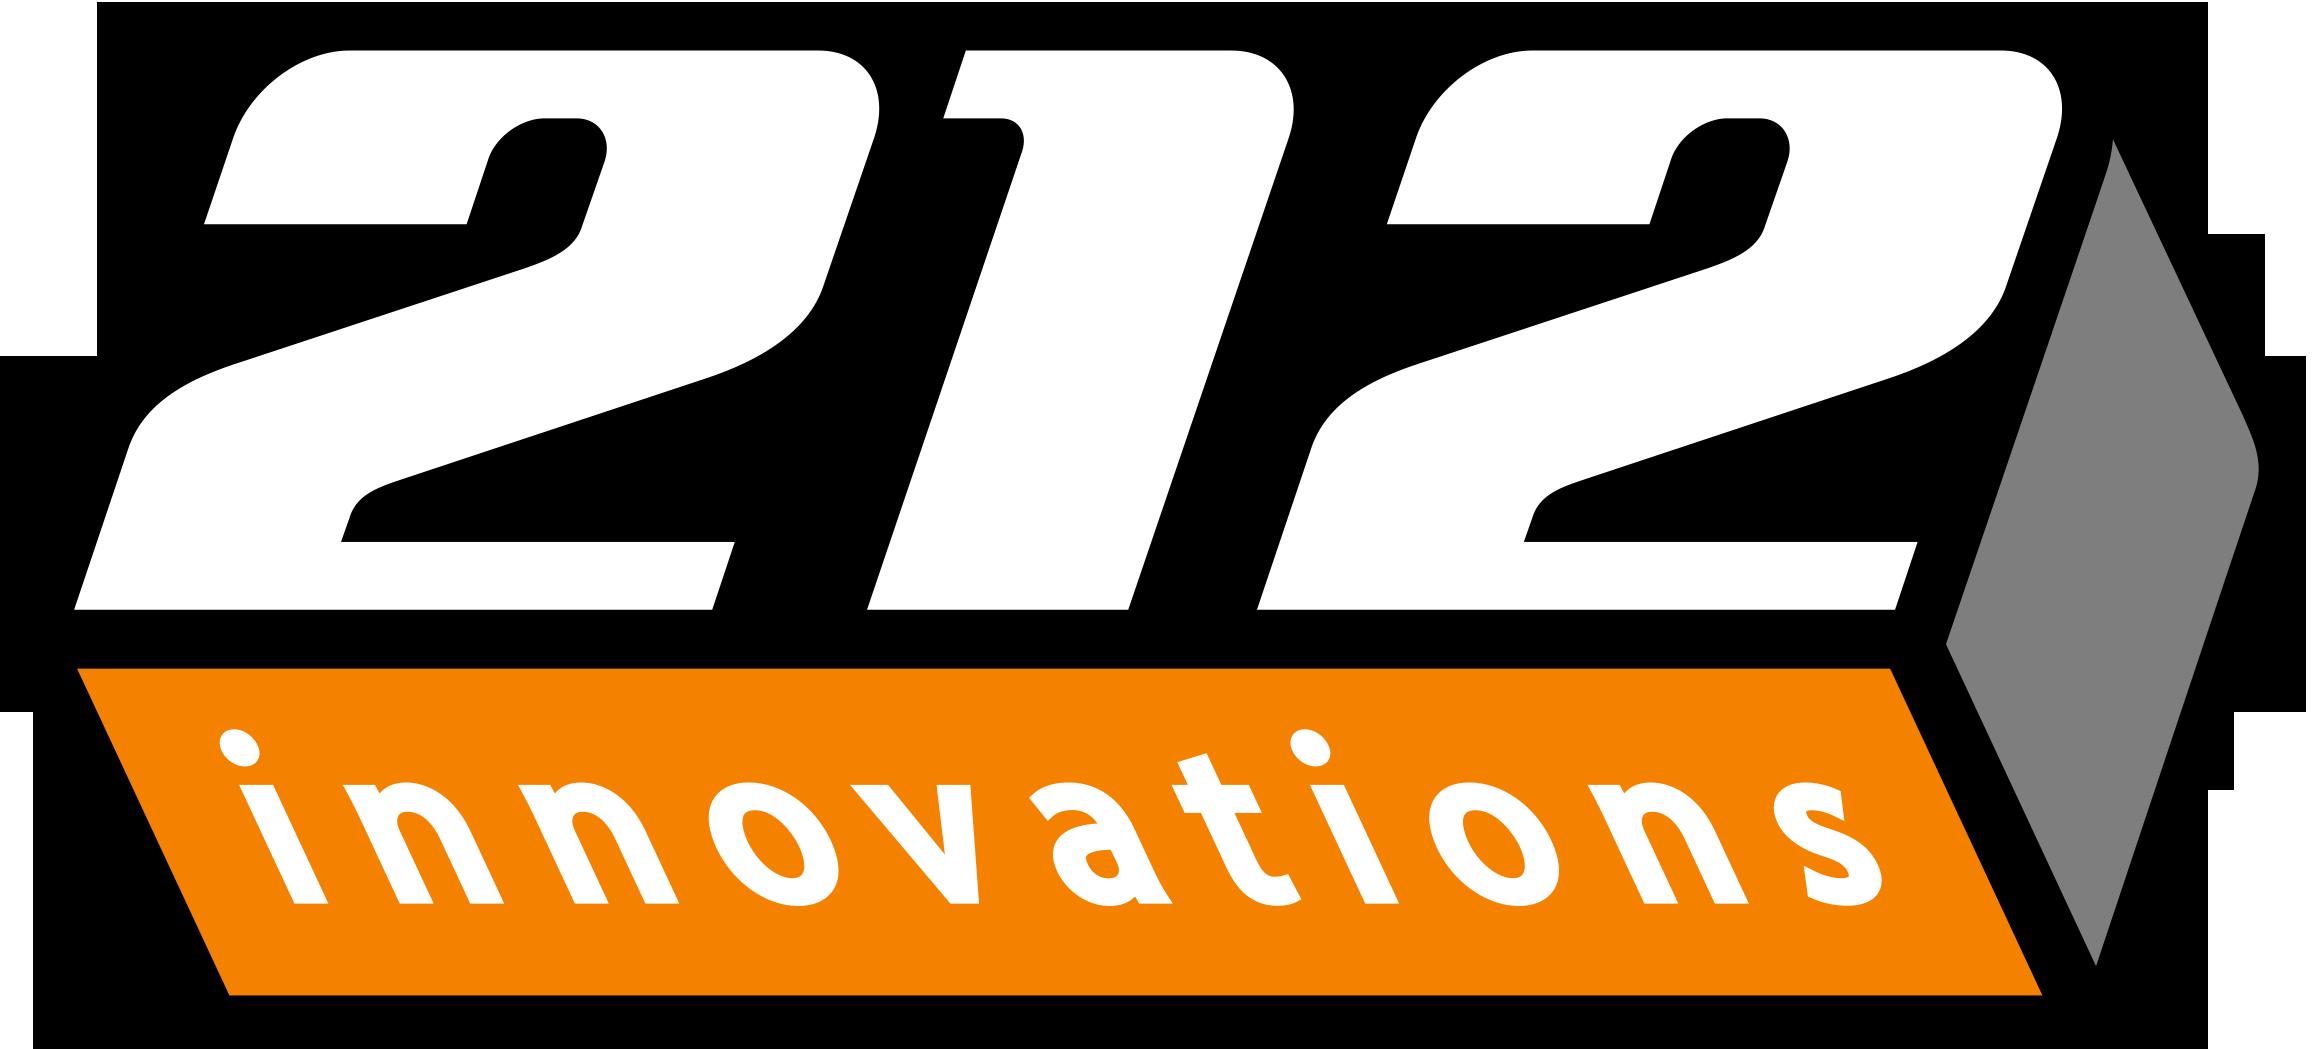 212 Innovations - ad image